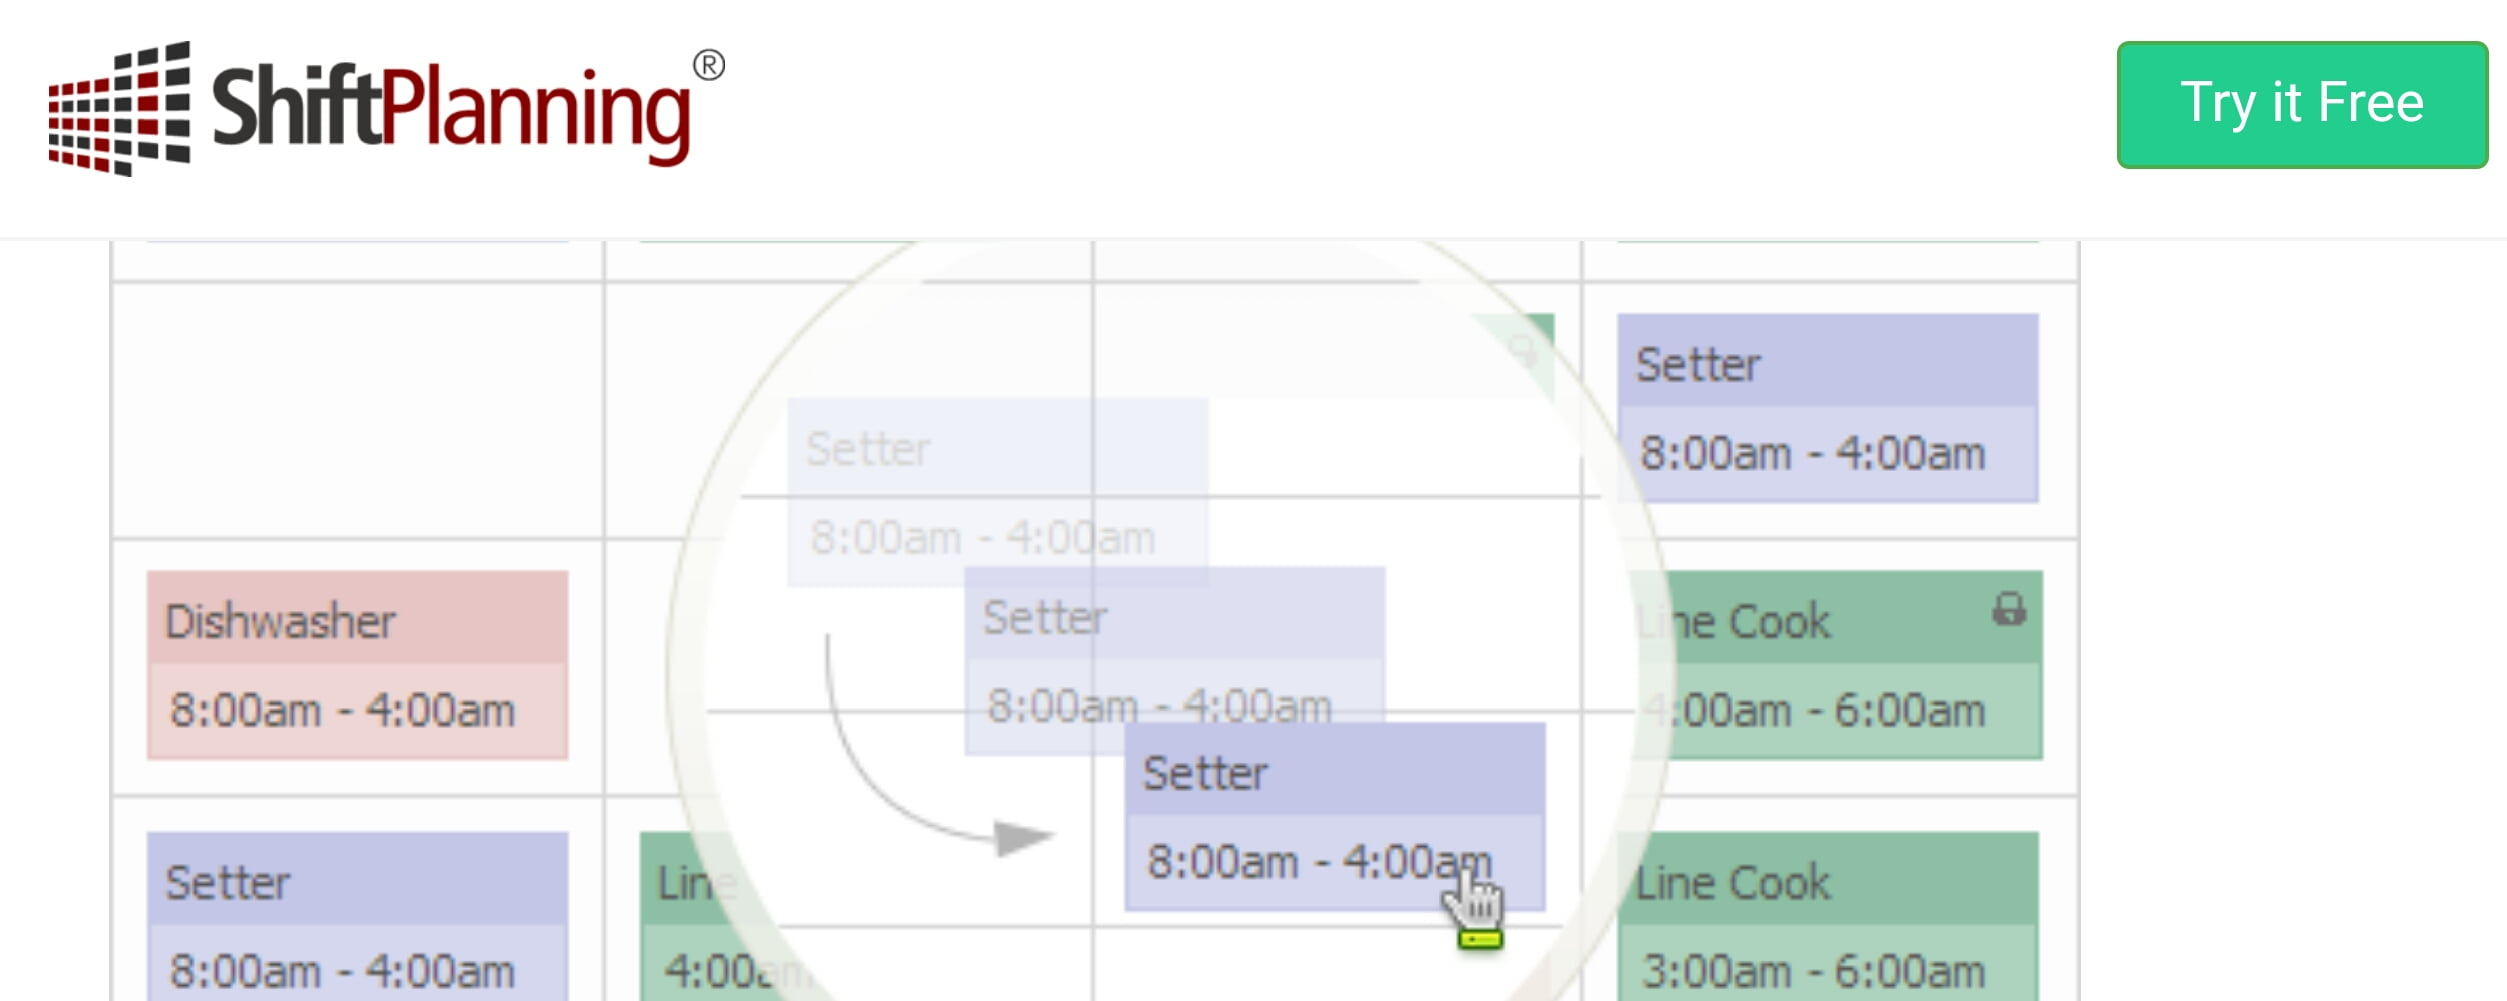 Shiftplanning employee scheduling program